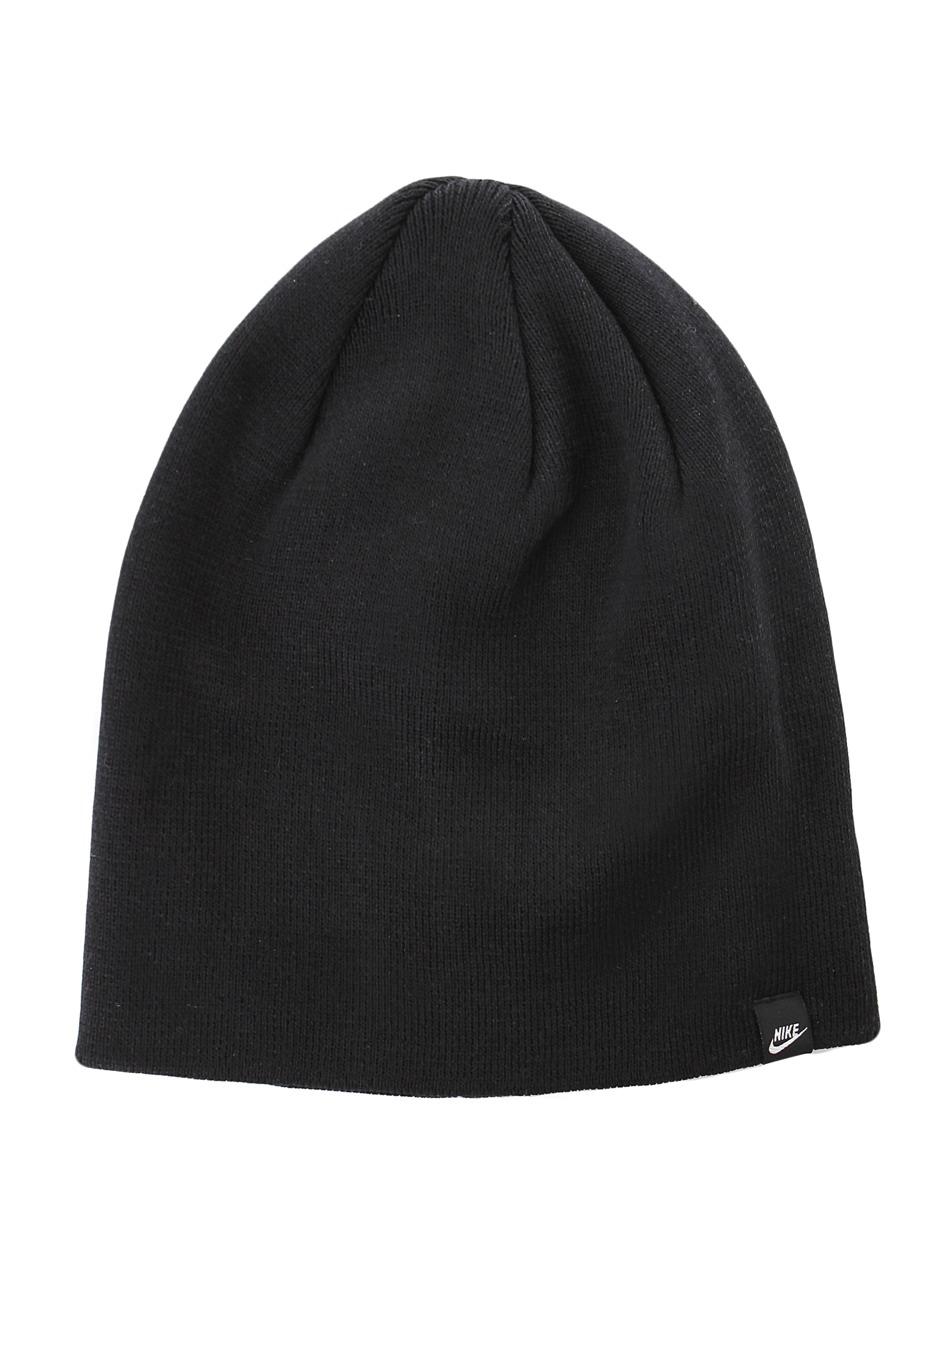 Nike - Solid Futura Label - Beanie - Streetwear Shop - Impericon.com UK e5c58a9d8fc